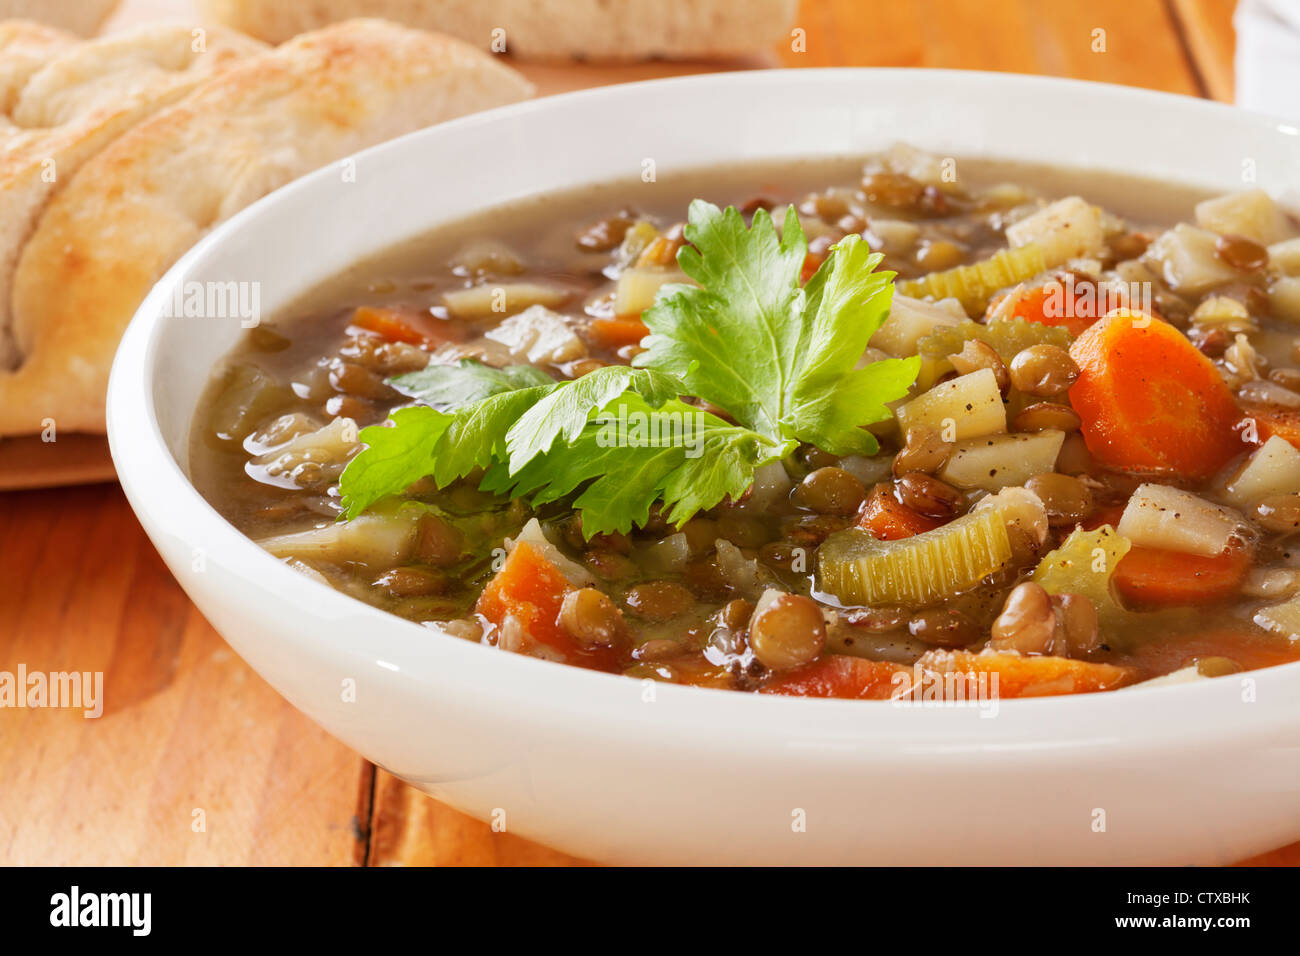 Green lentil soup with vegetables. - Stock Image